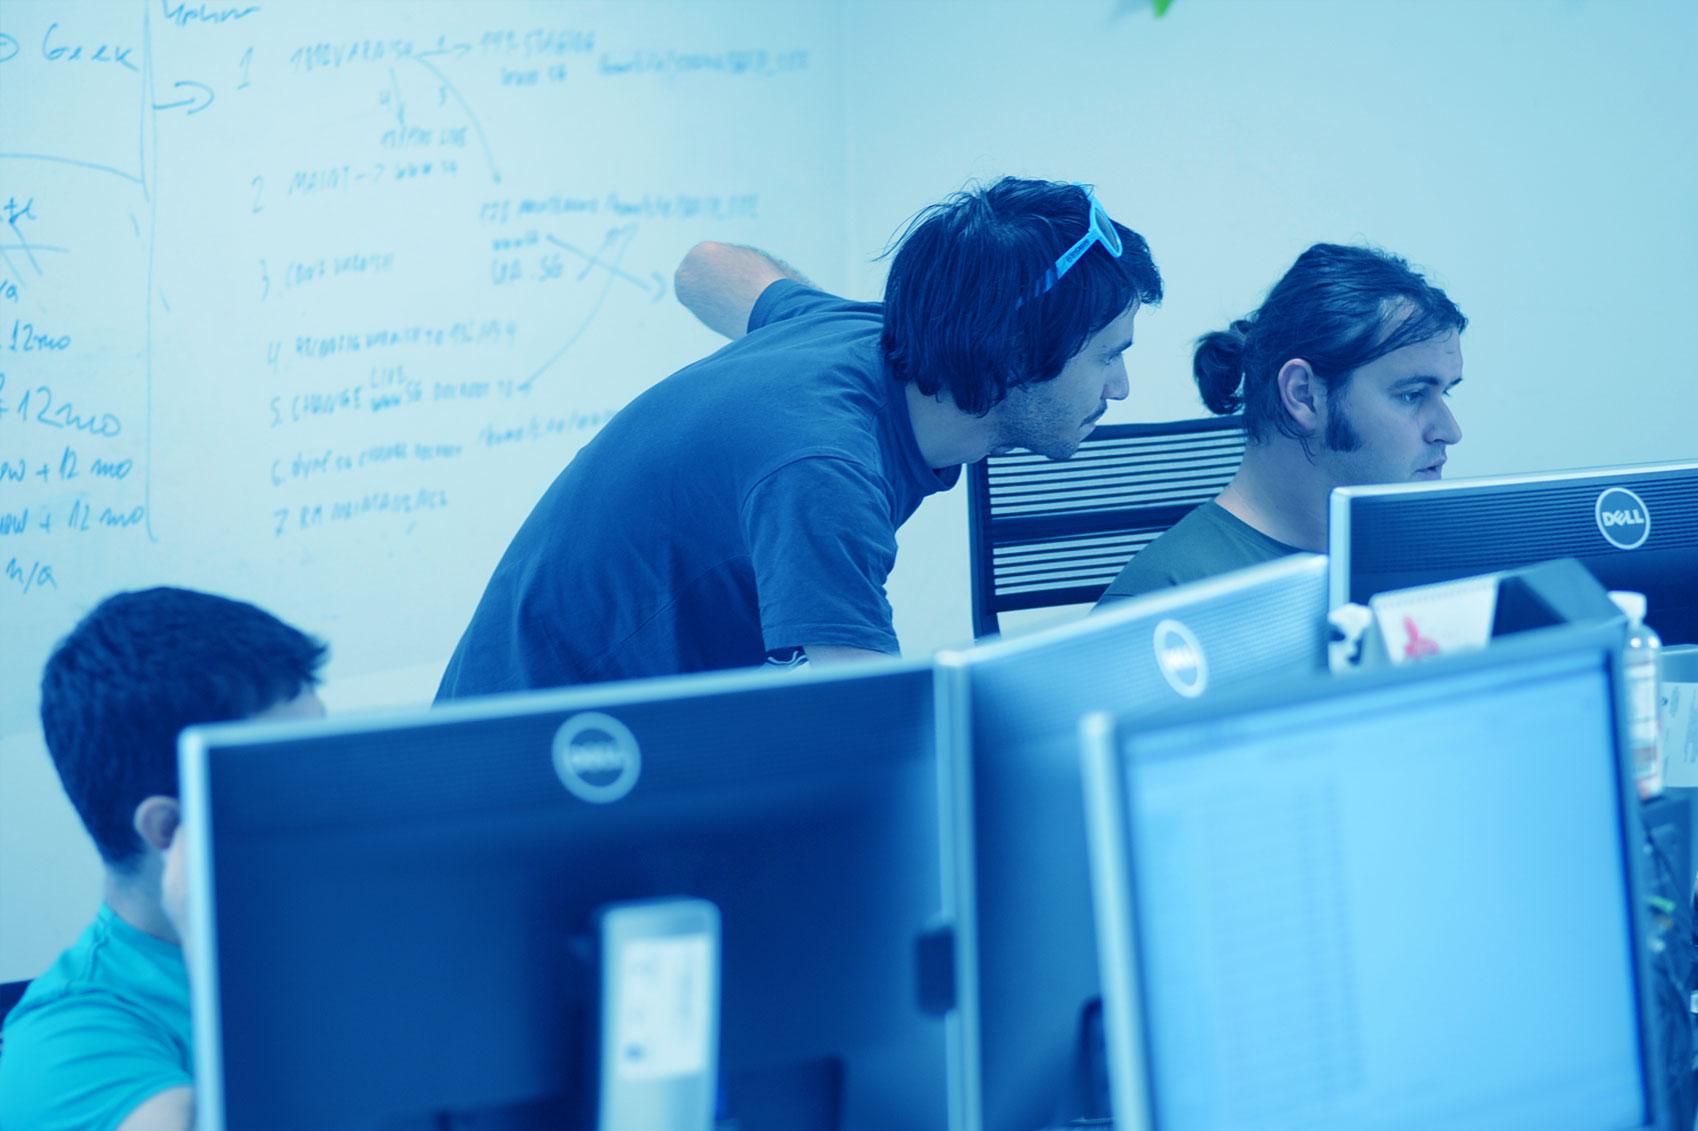 e730.cloud - Software invio spese sanitarie